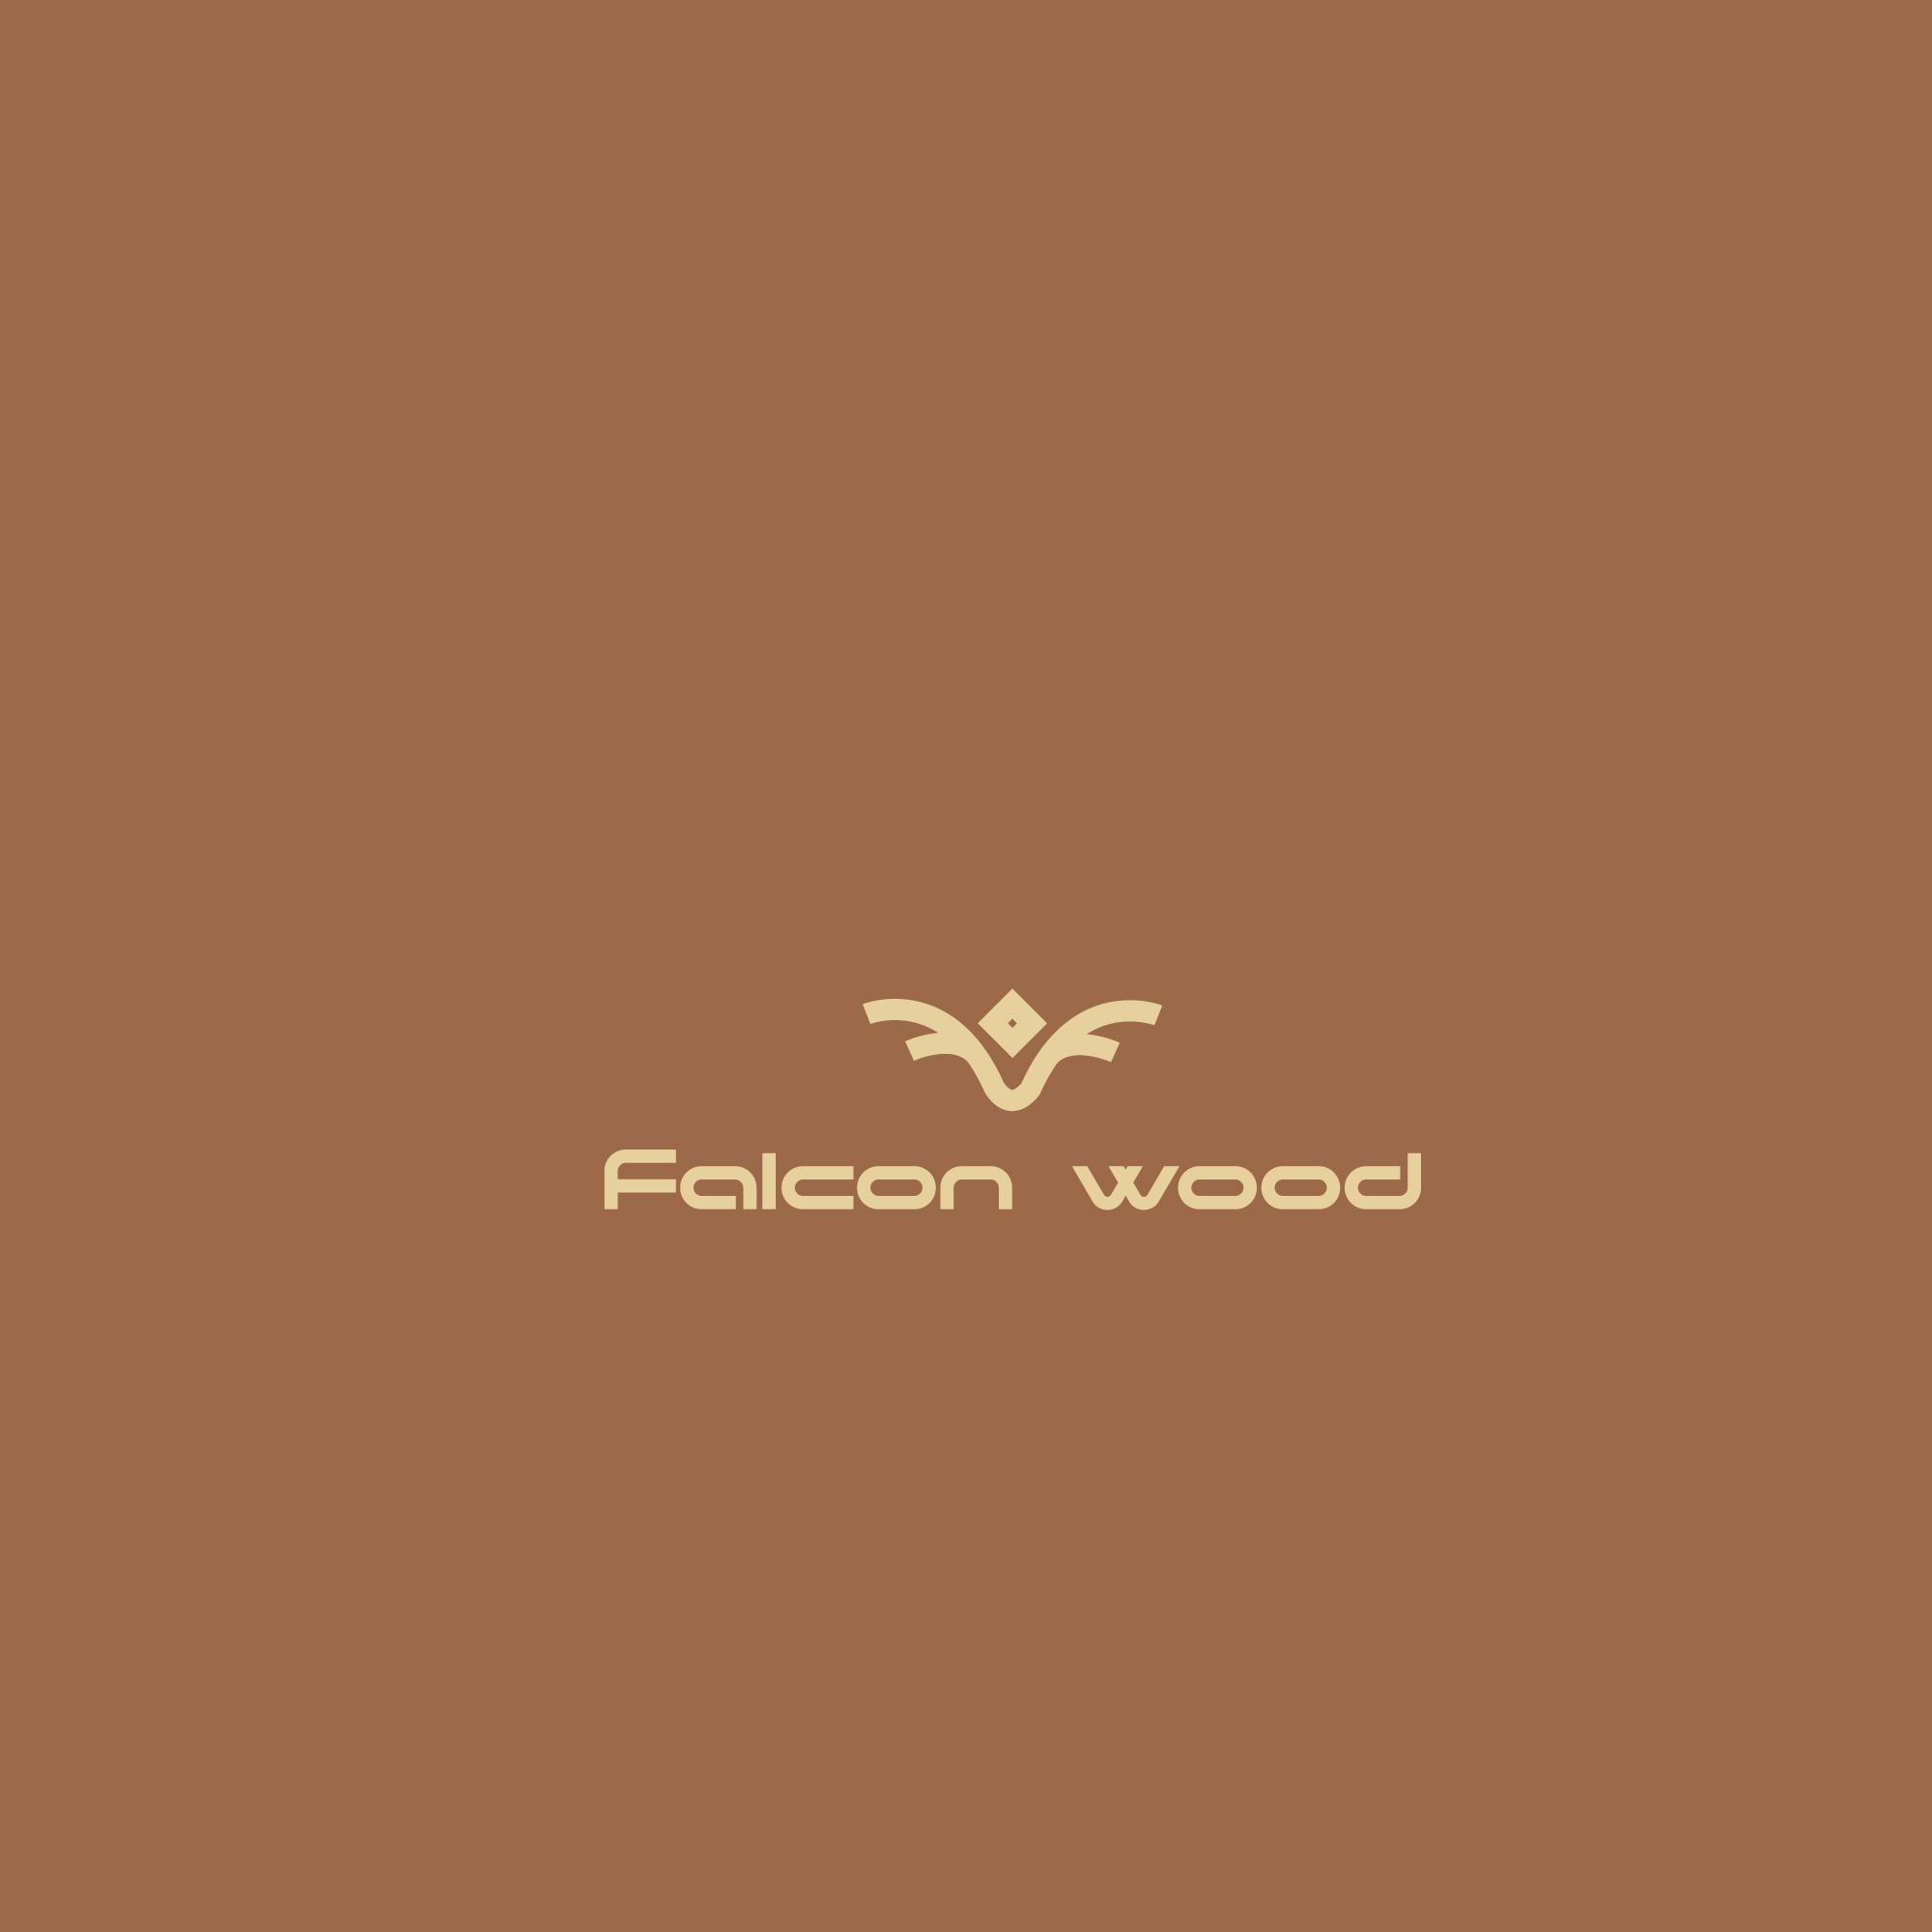 Дизайн логотипа столярной мастерской фото f_2145cfe6318ebfbb.jpg